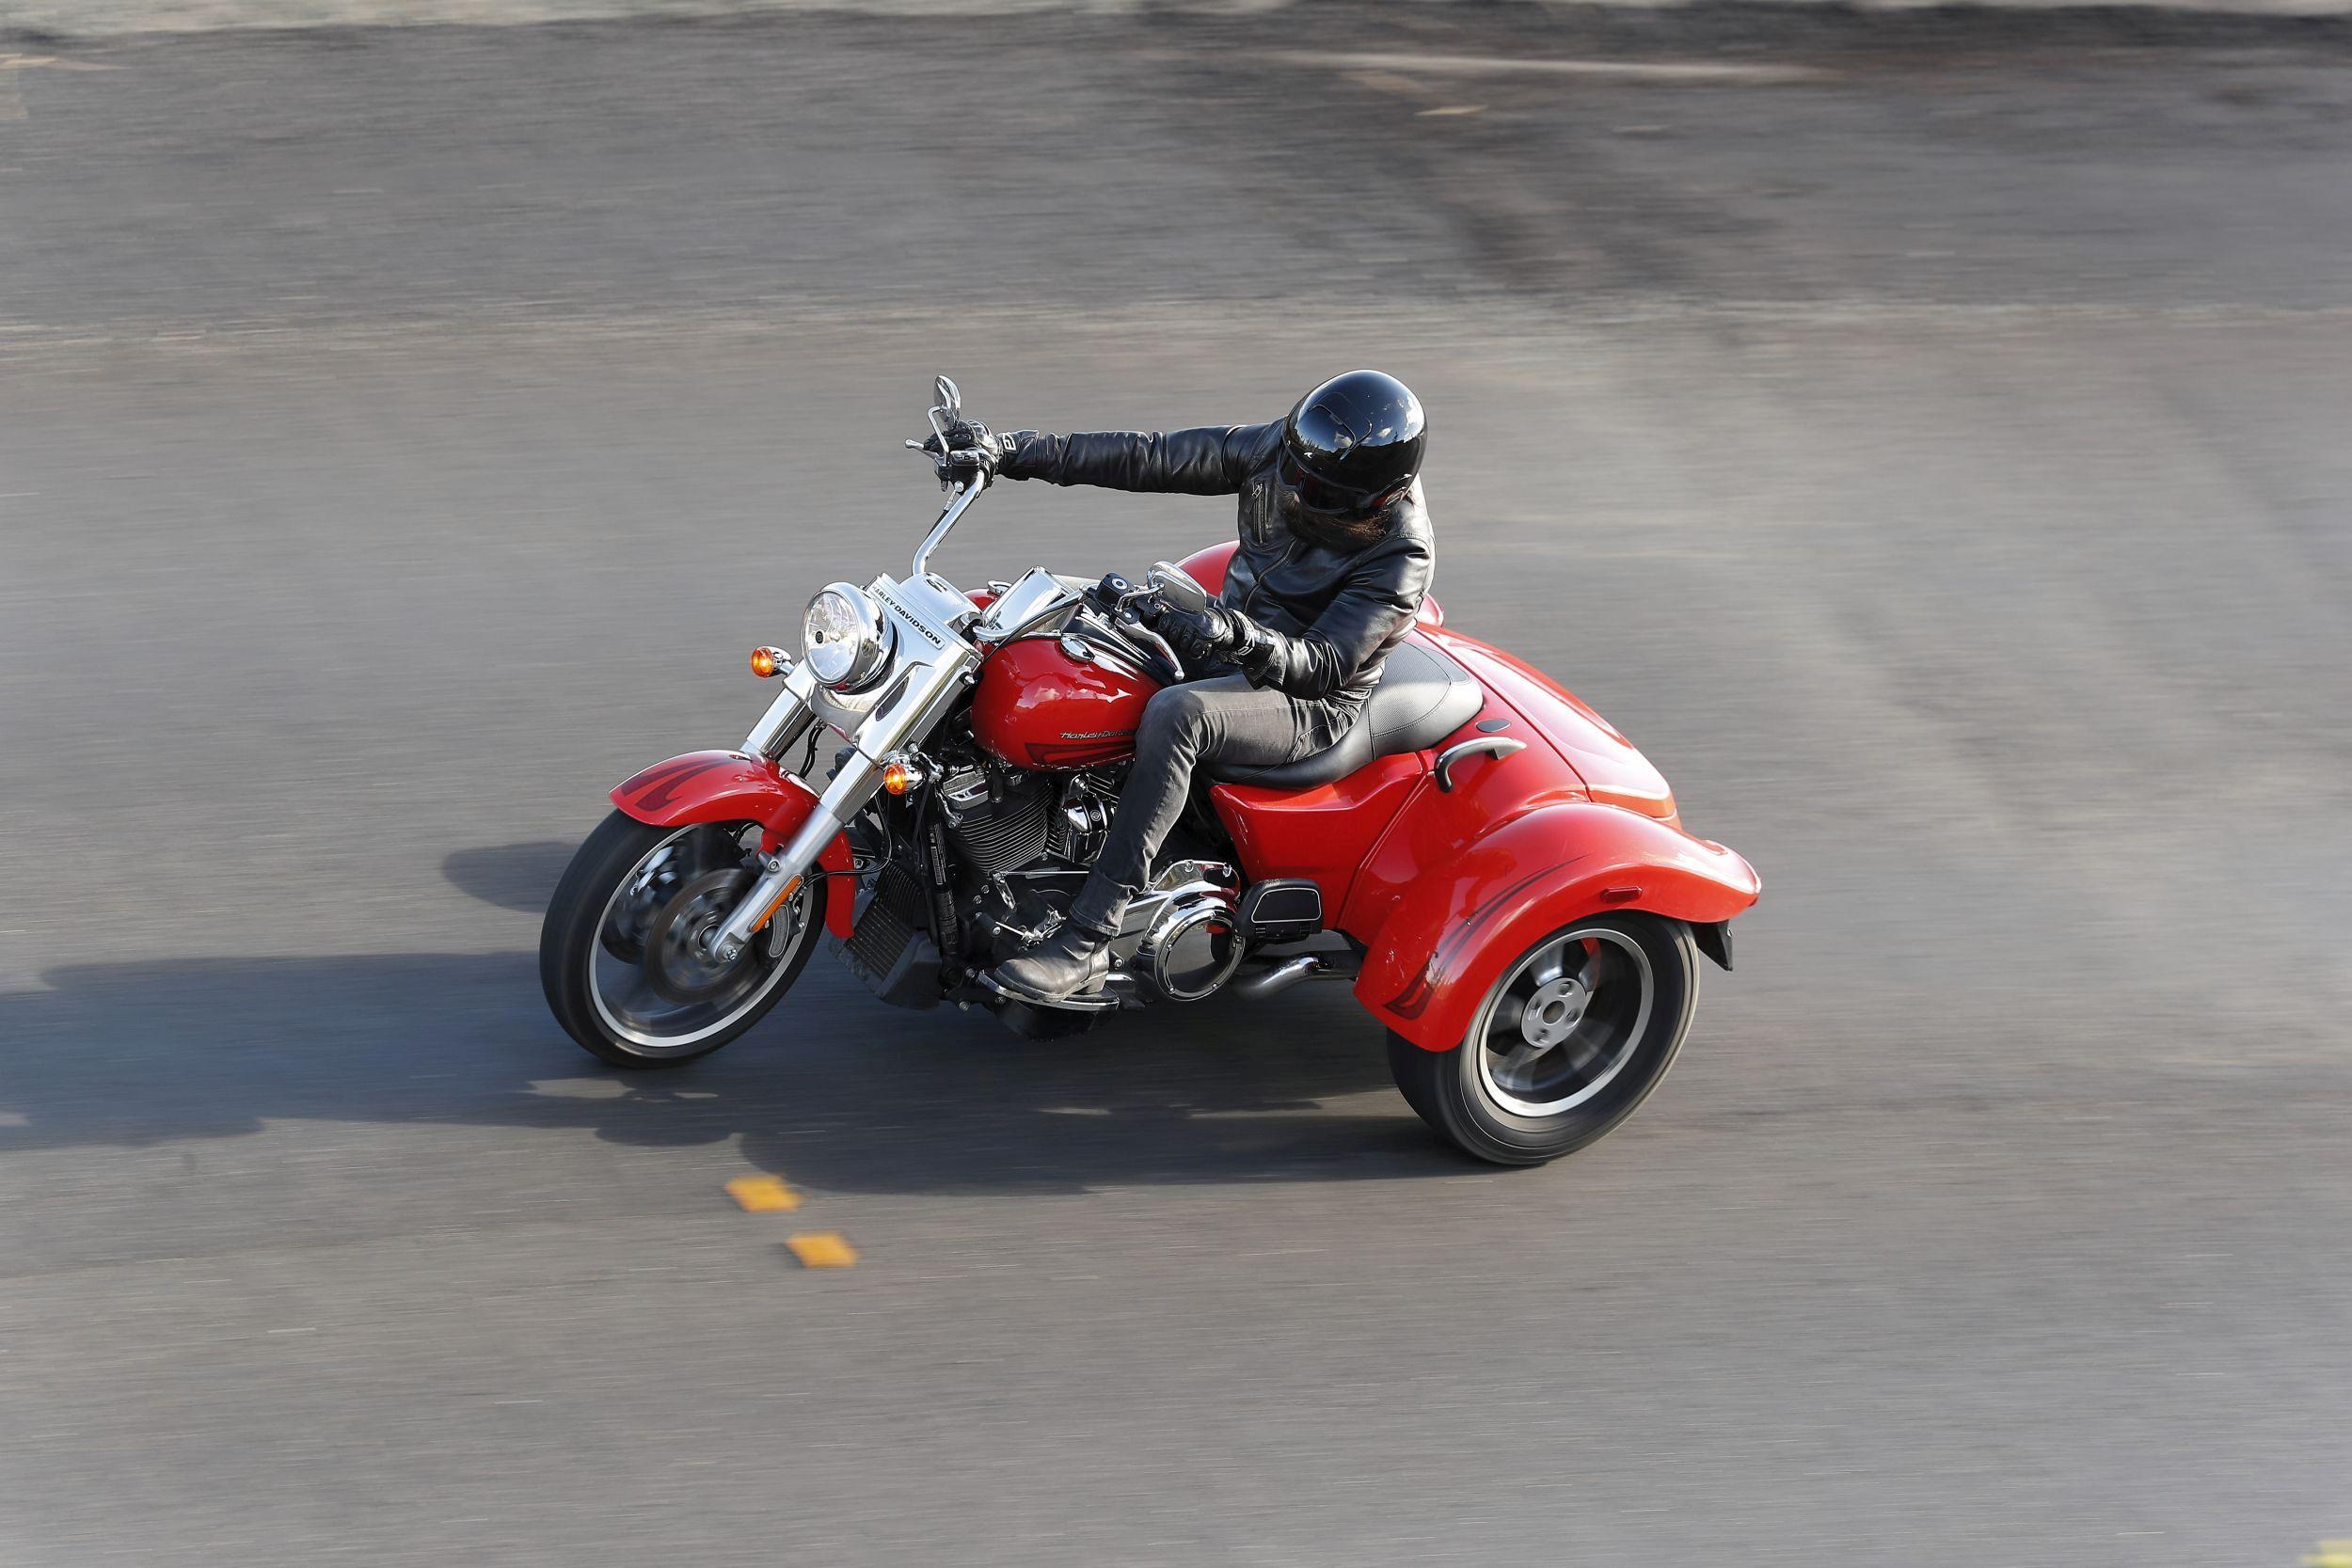 2017 Harley Davidson Tri Glide Ultra Review: Motorrad Occasion Harley-Davidson Tri Glide Ultra Classic